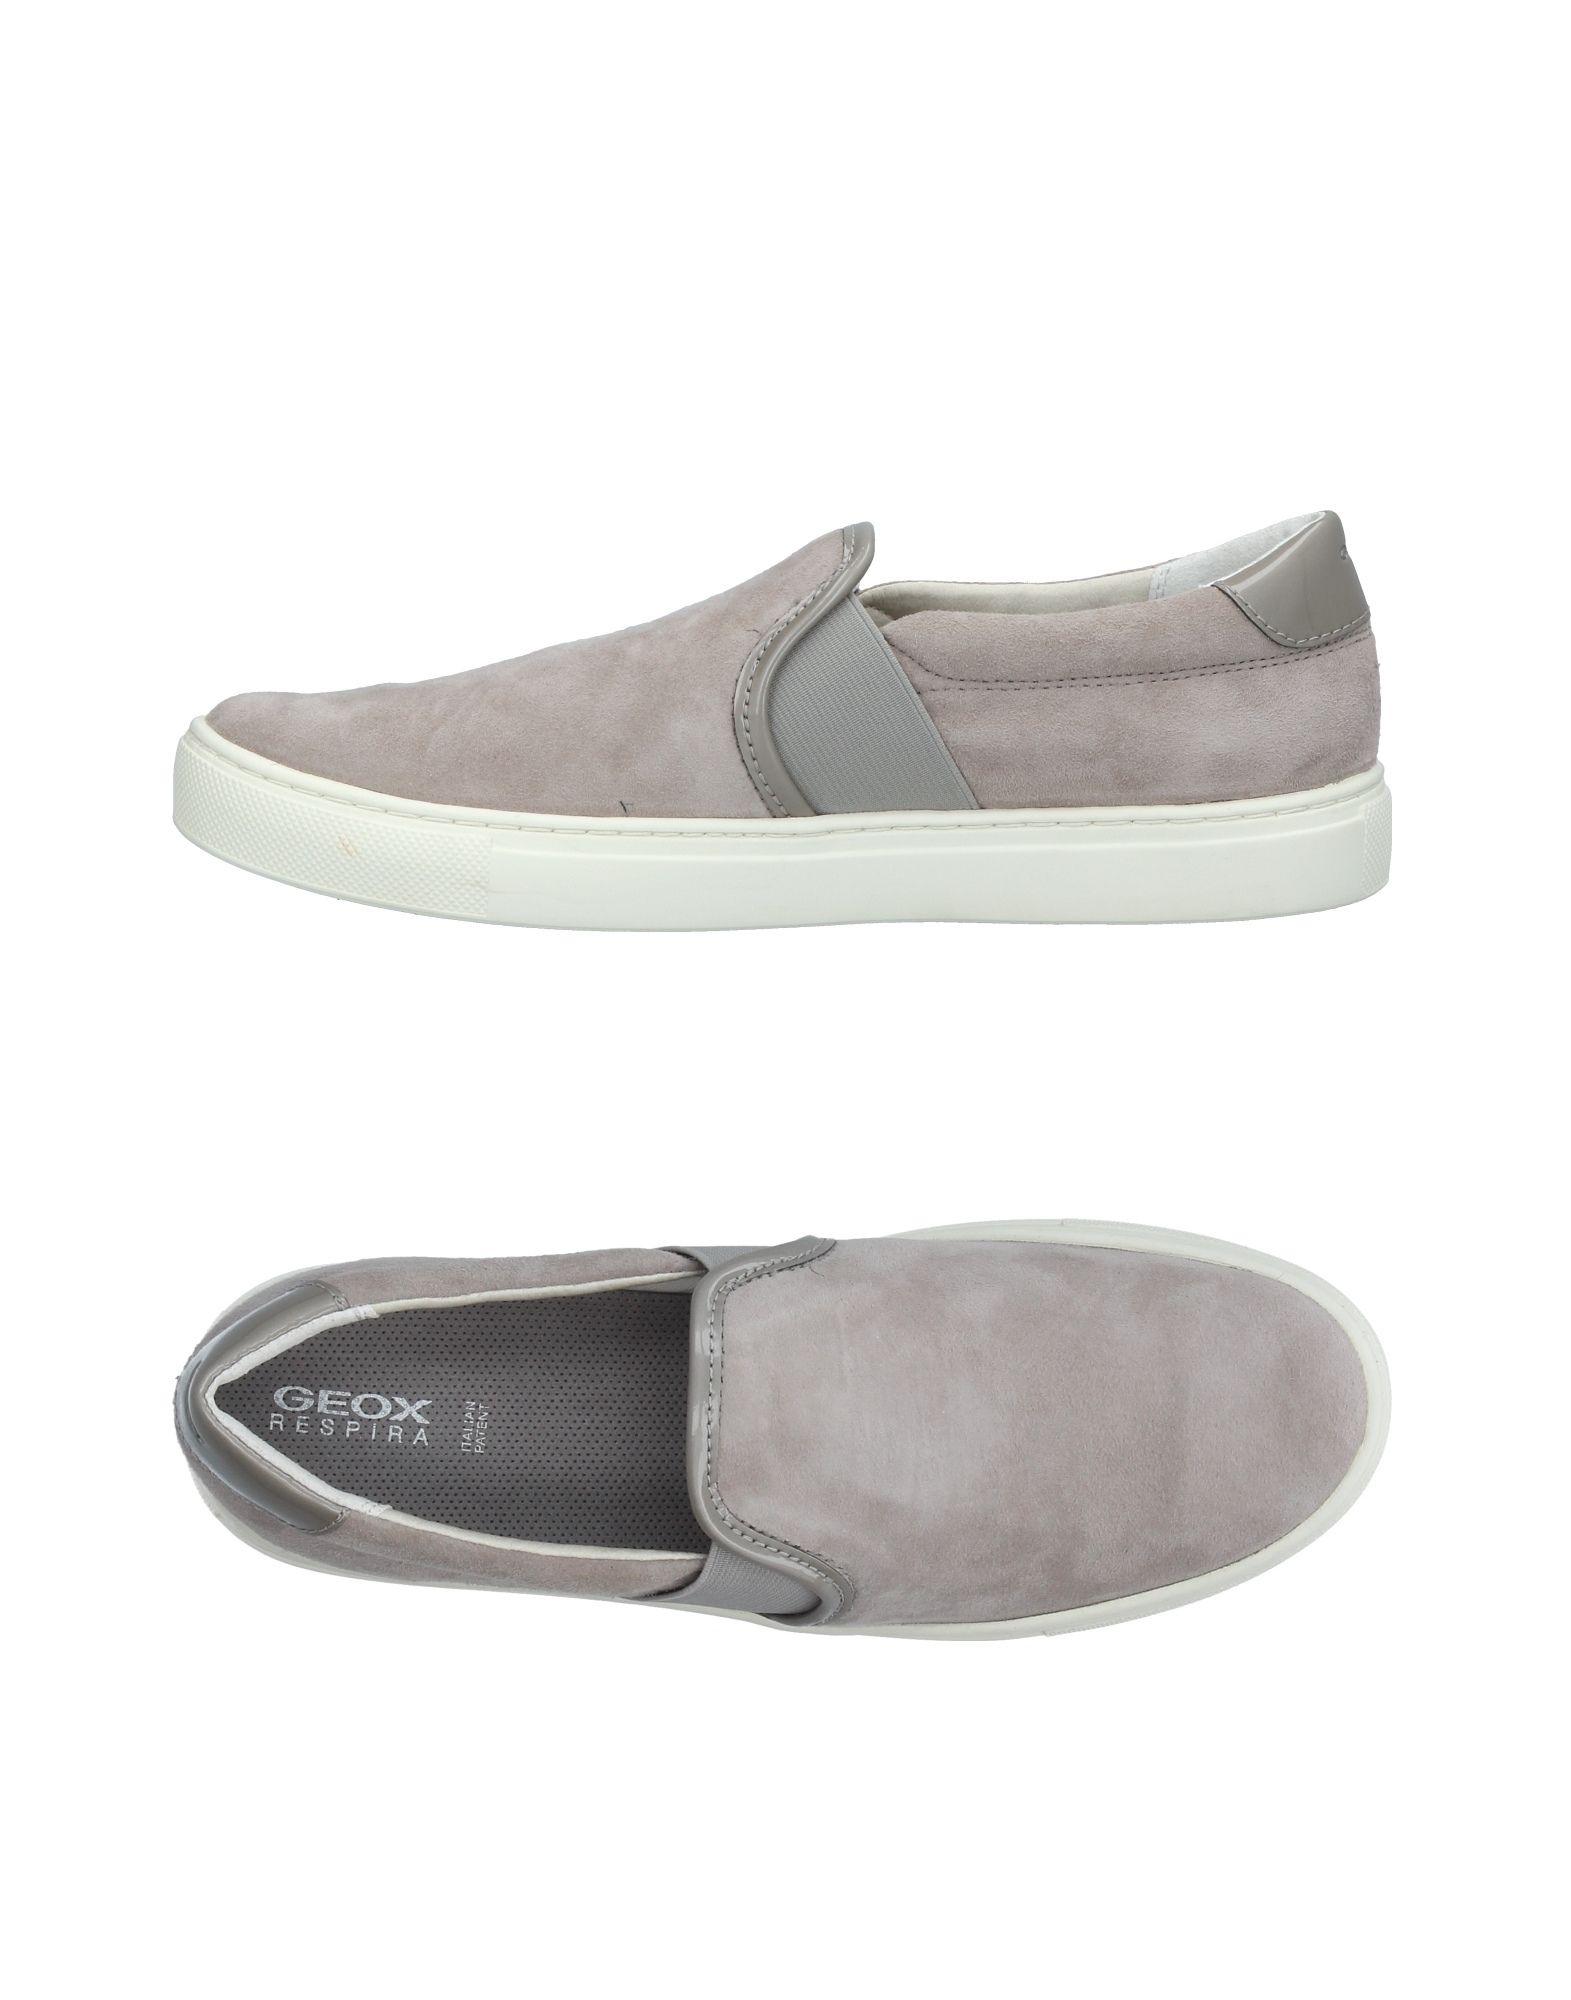 Moda Sneakers Geox Donna - 11393233SC